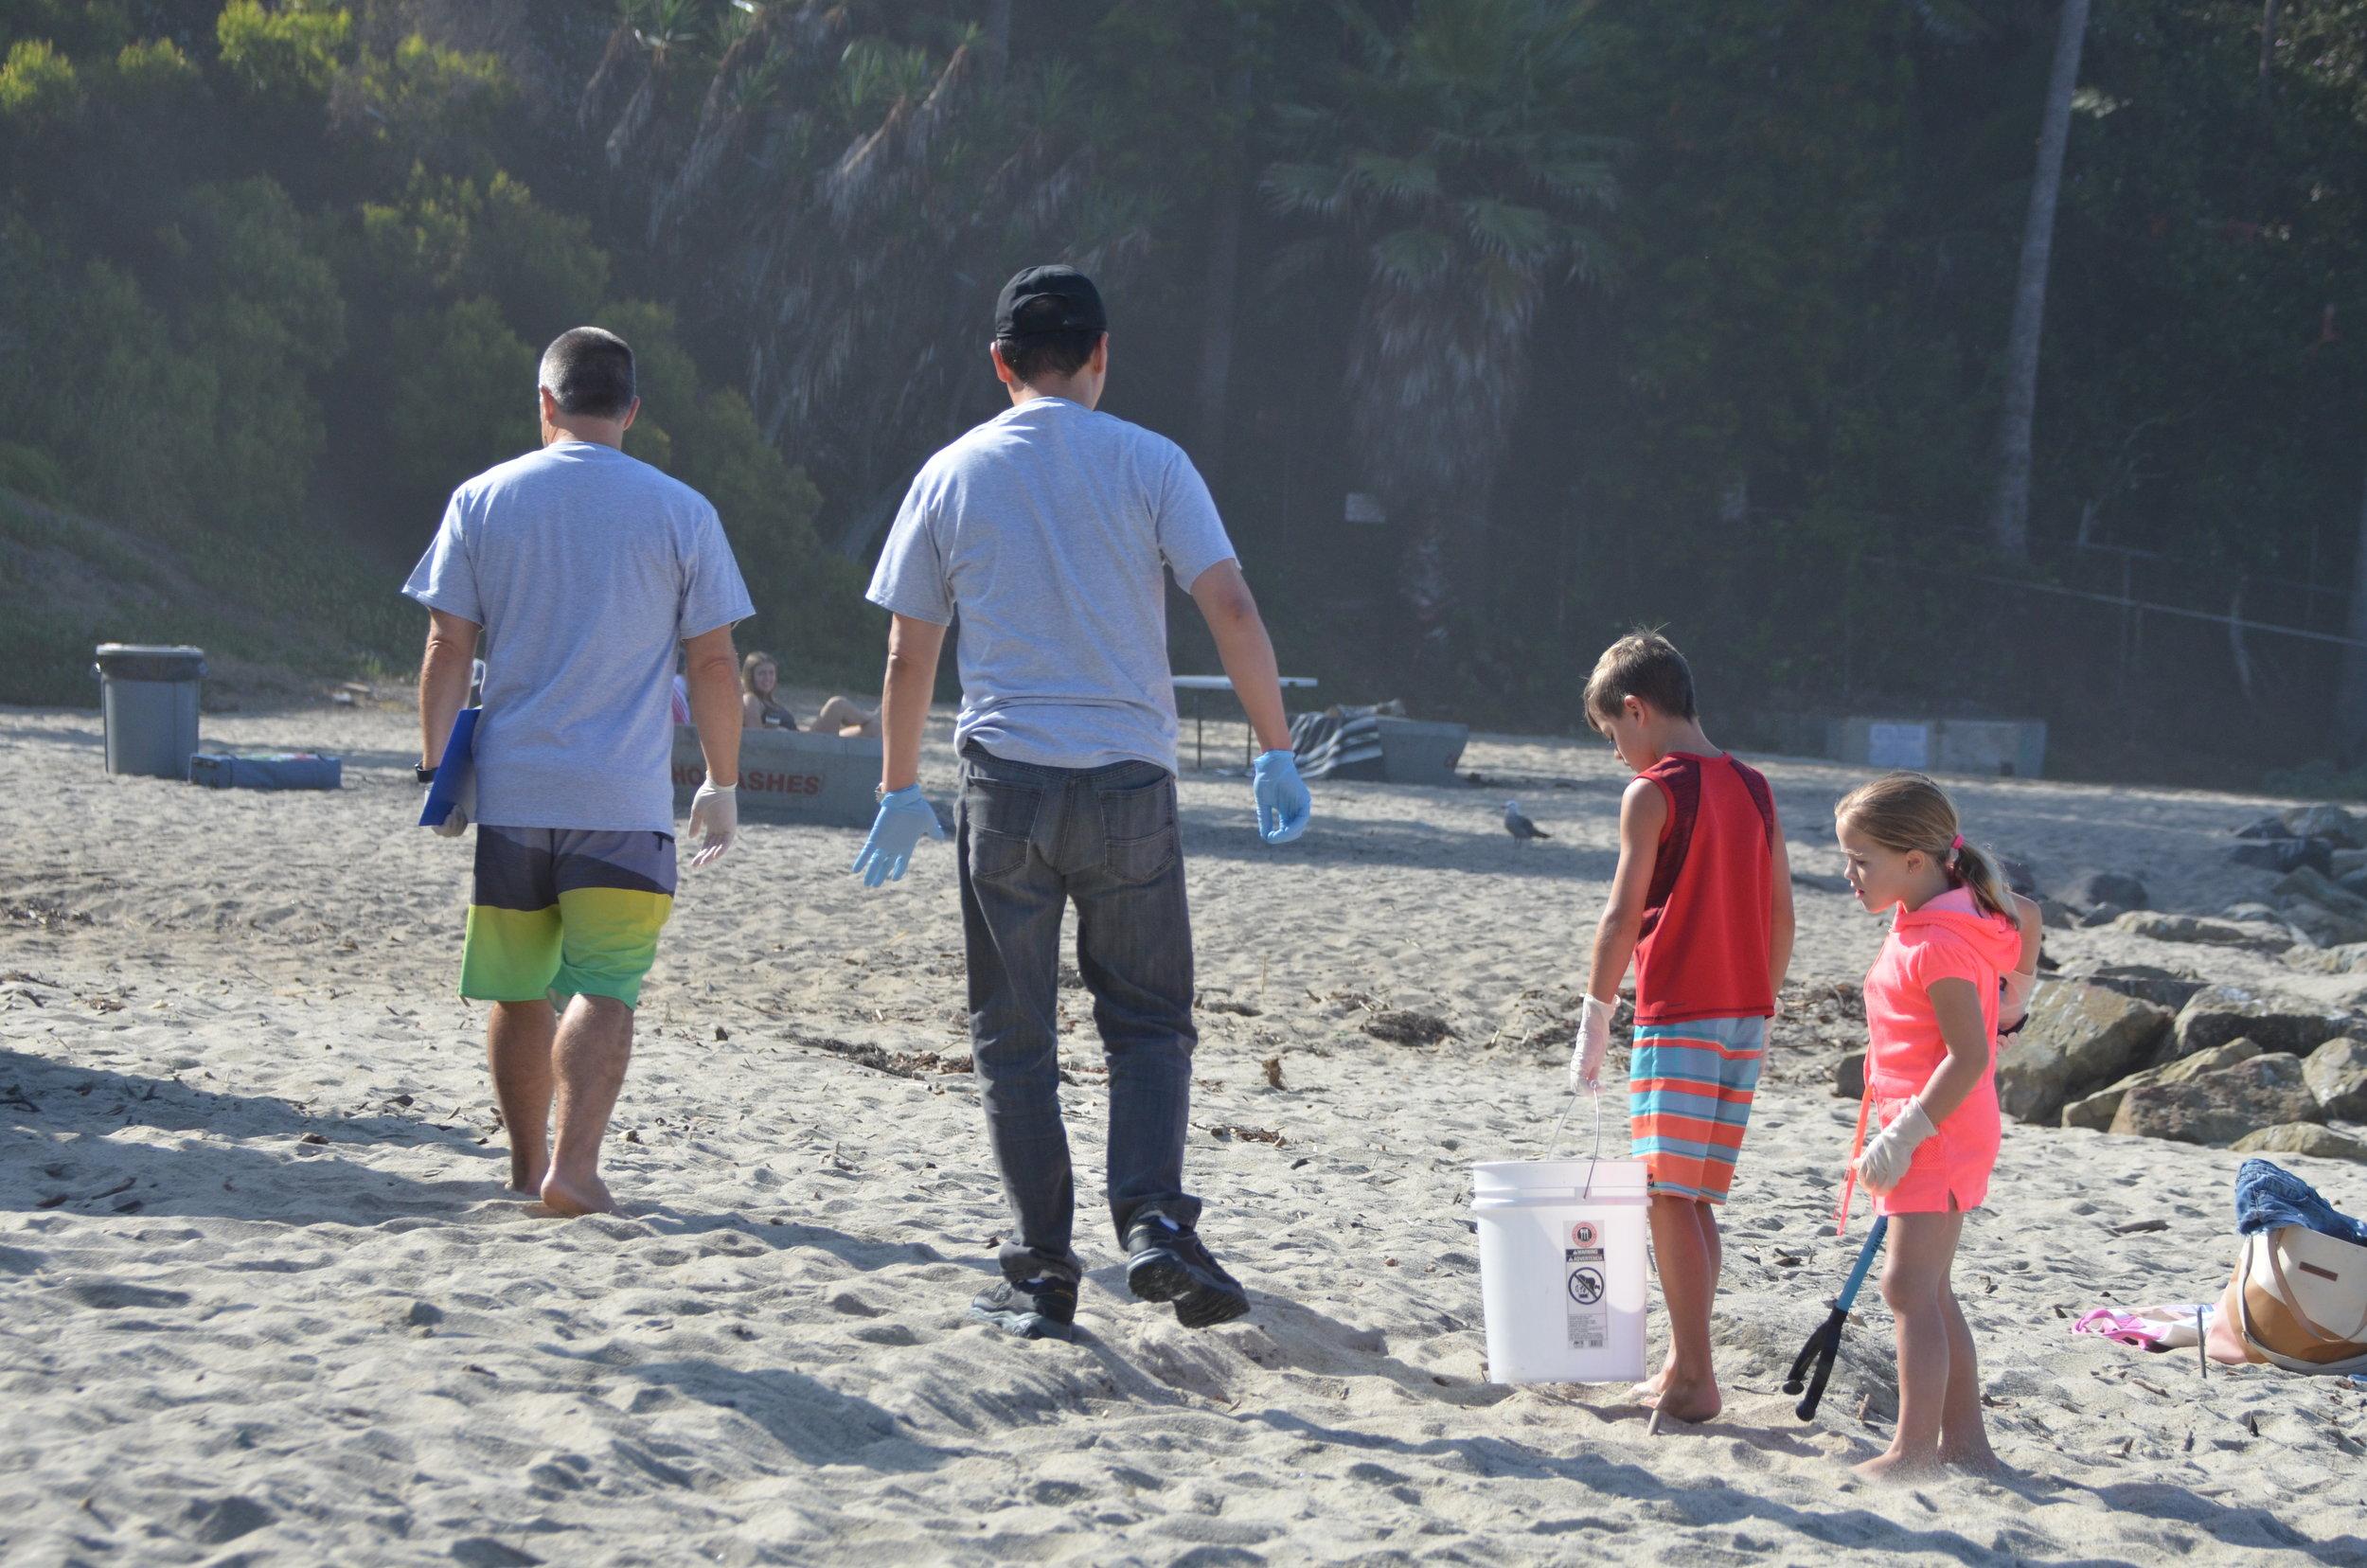 7.24.19 Aliso beach clean up (7).JPG